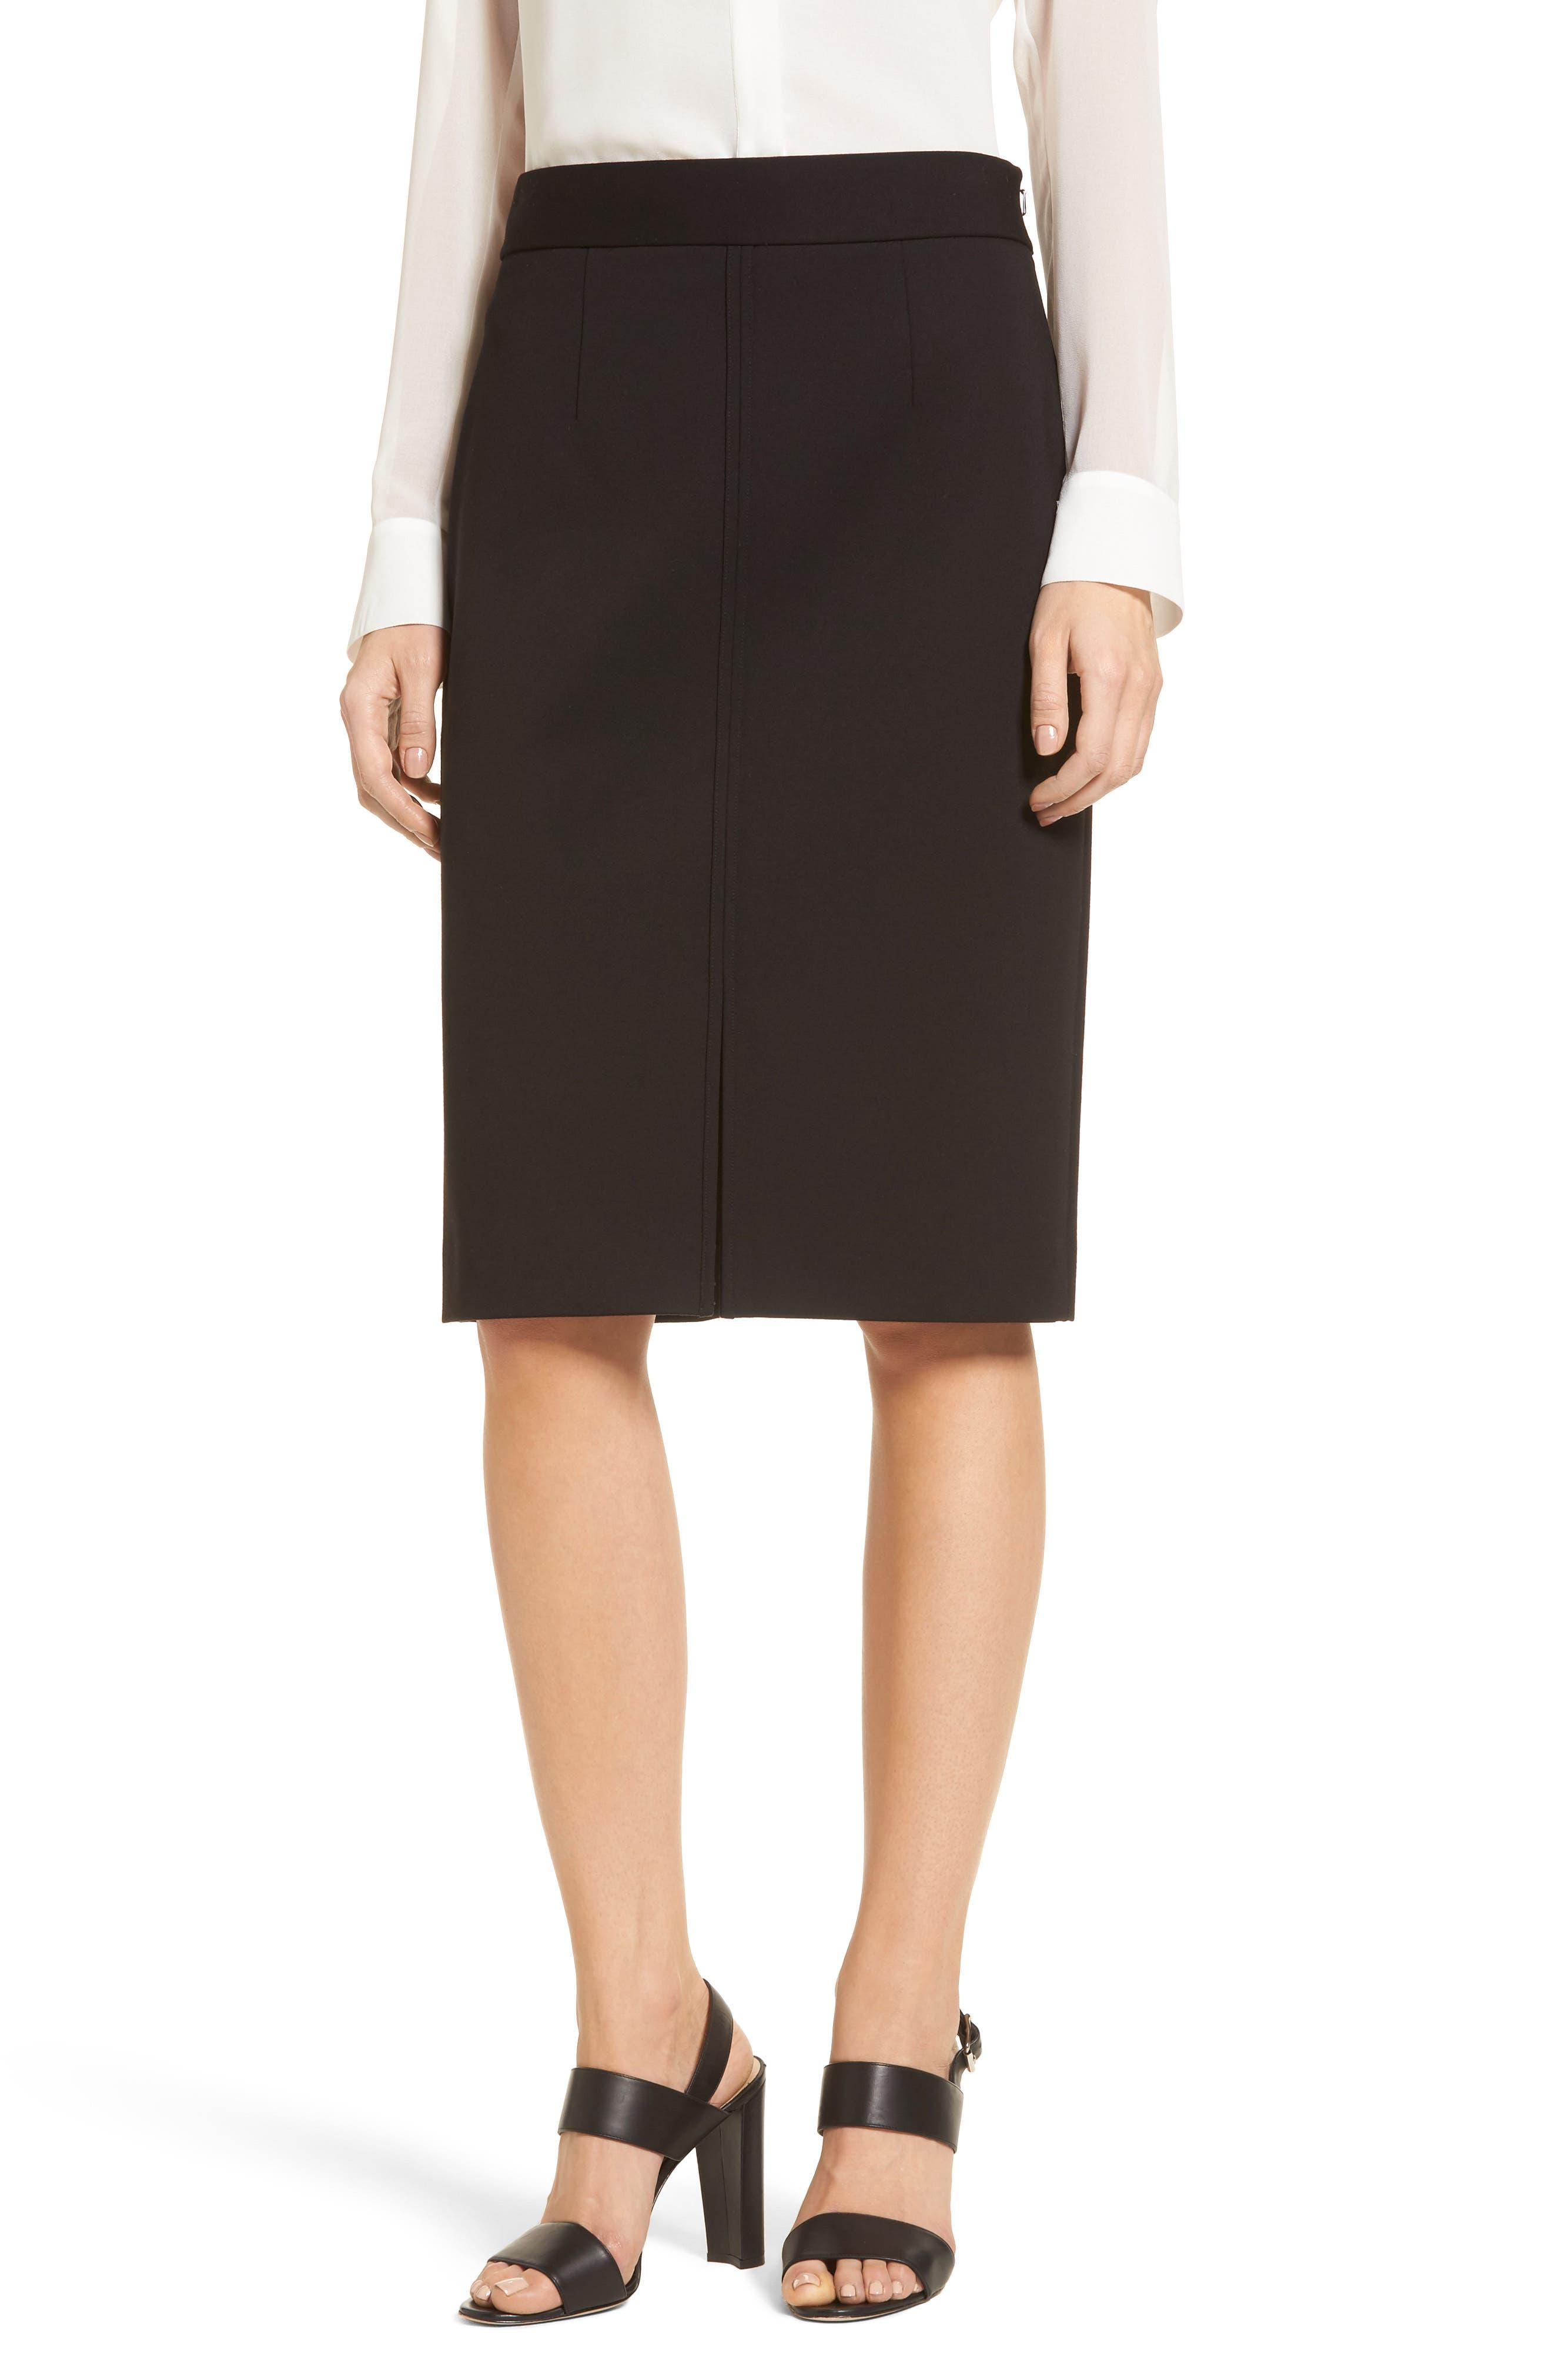 Alternate Image 1 Selected - Emerson Rose Ponte Knit Pencil Skirt